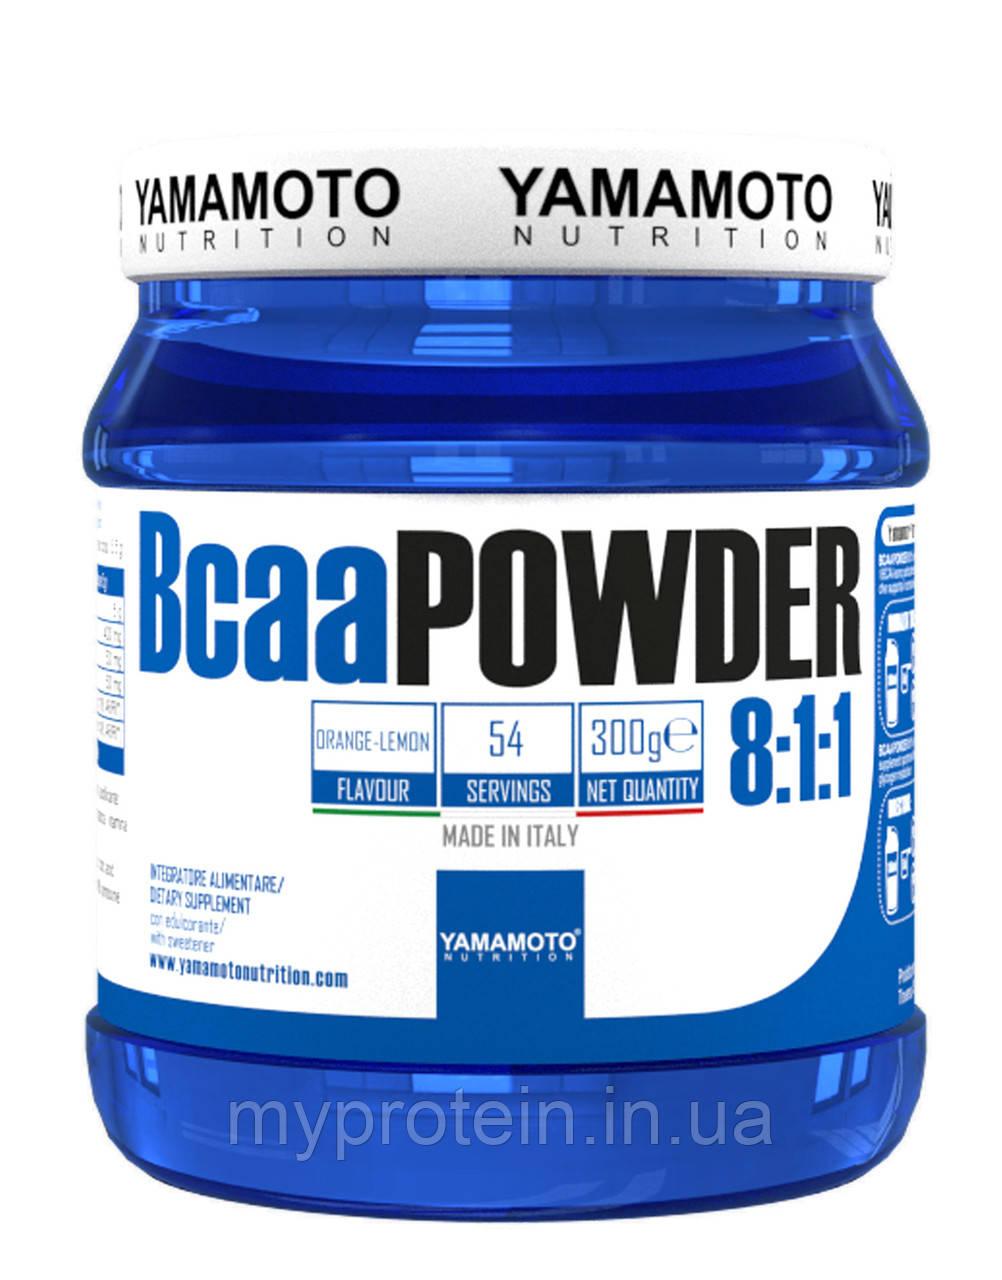 Yamamoto nutritionBCAABcaa Powder 8:1:1300 g